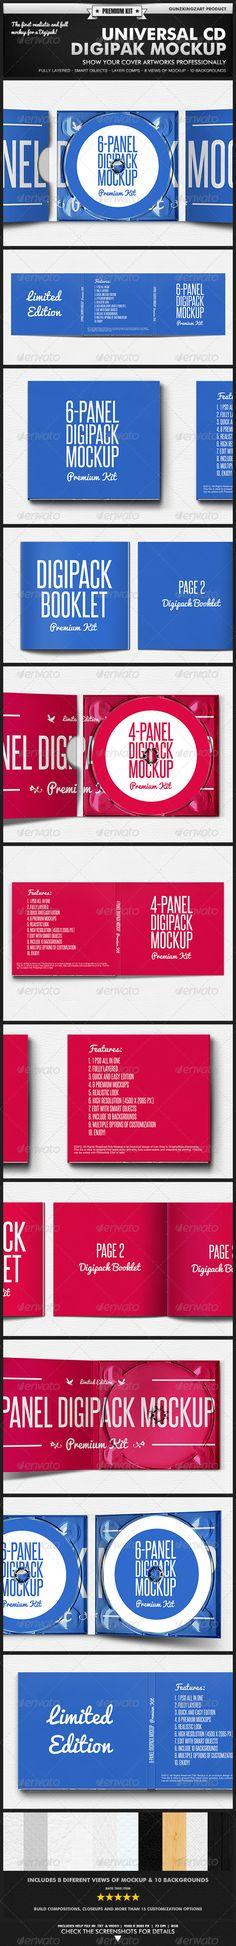 Digipak Templates - DVD Duplication | Disc Manufacturing